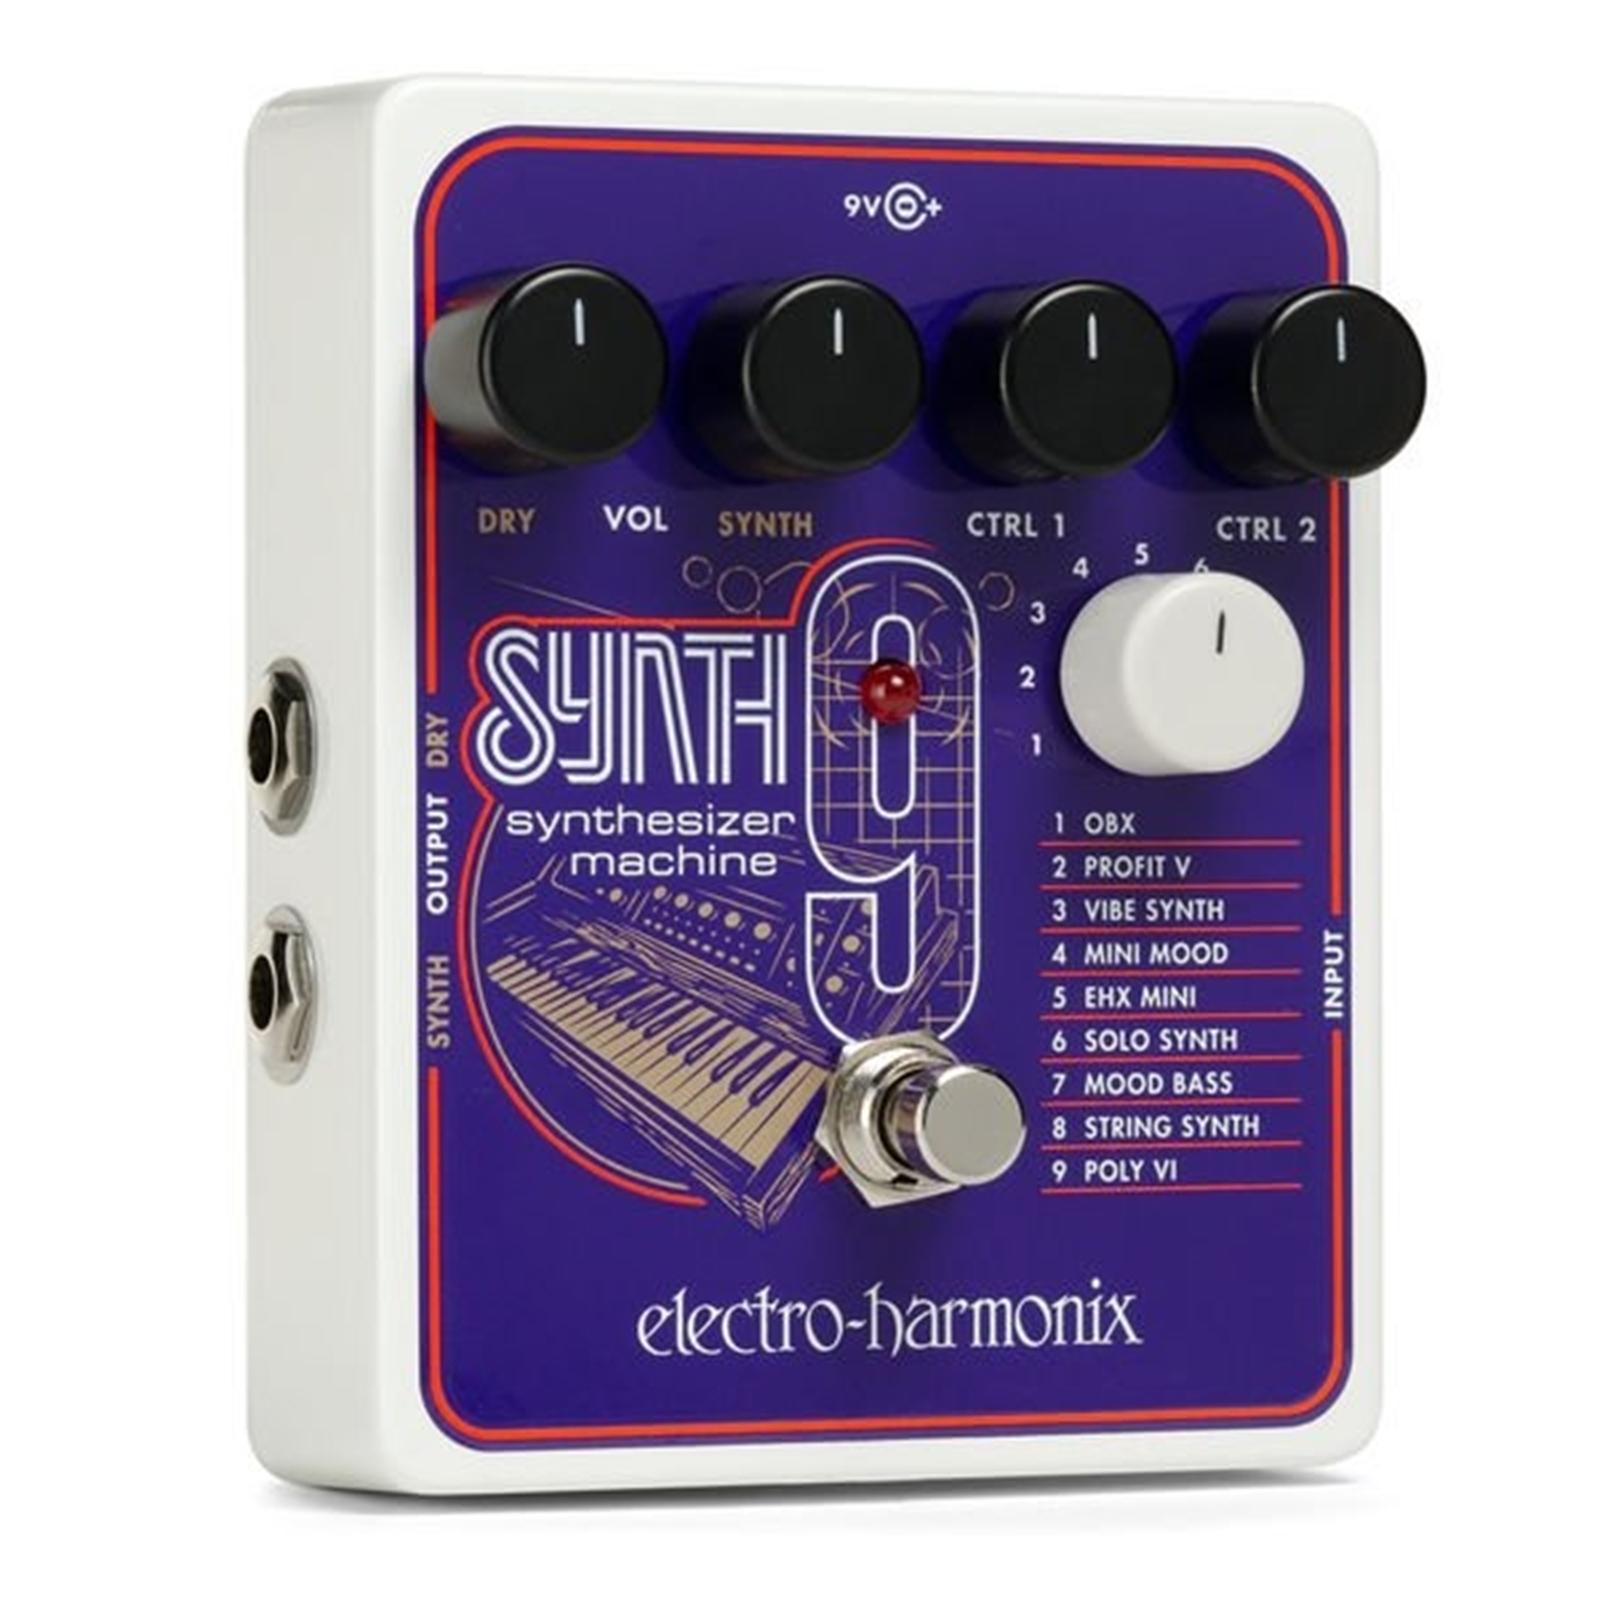 Electro-Harmonix SYNTH9 Synthesizer Machine Pedal